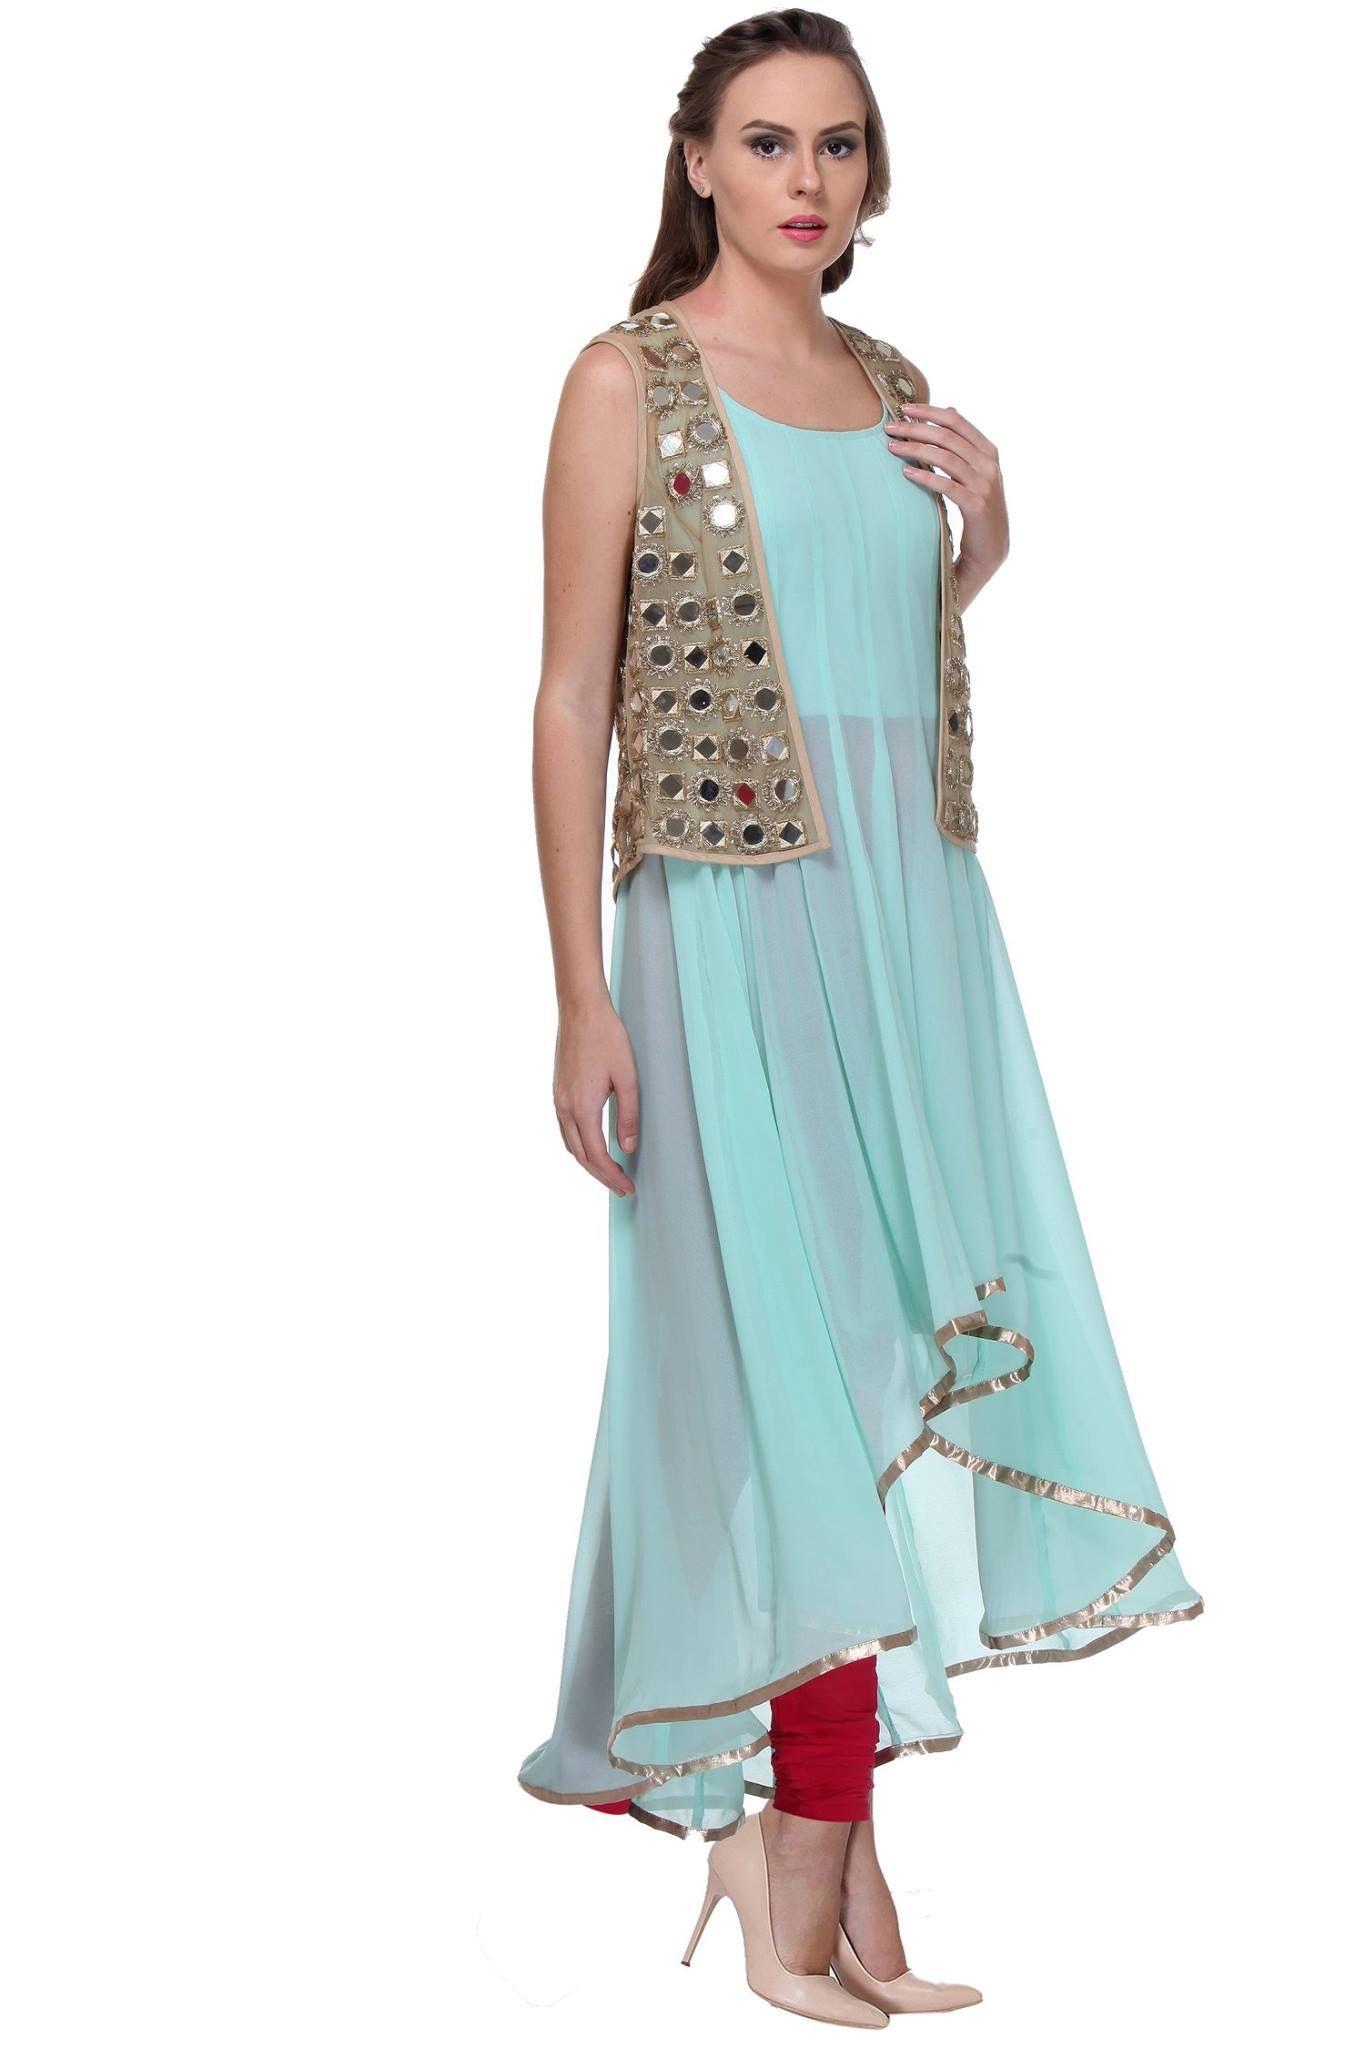 Pin by sonal mehta on kurti | Pinterest | Kurti, Indian wear and Desi